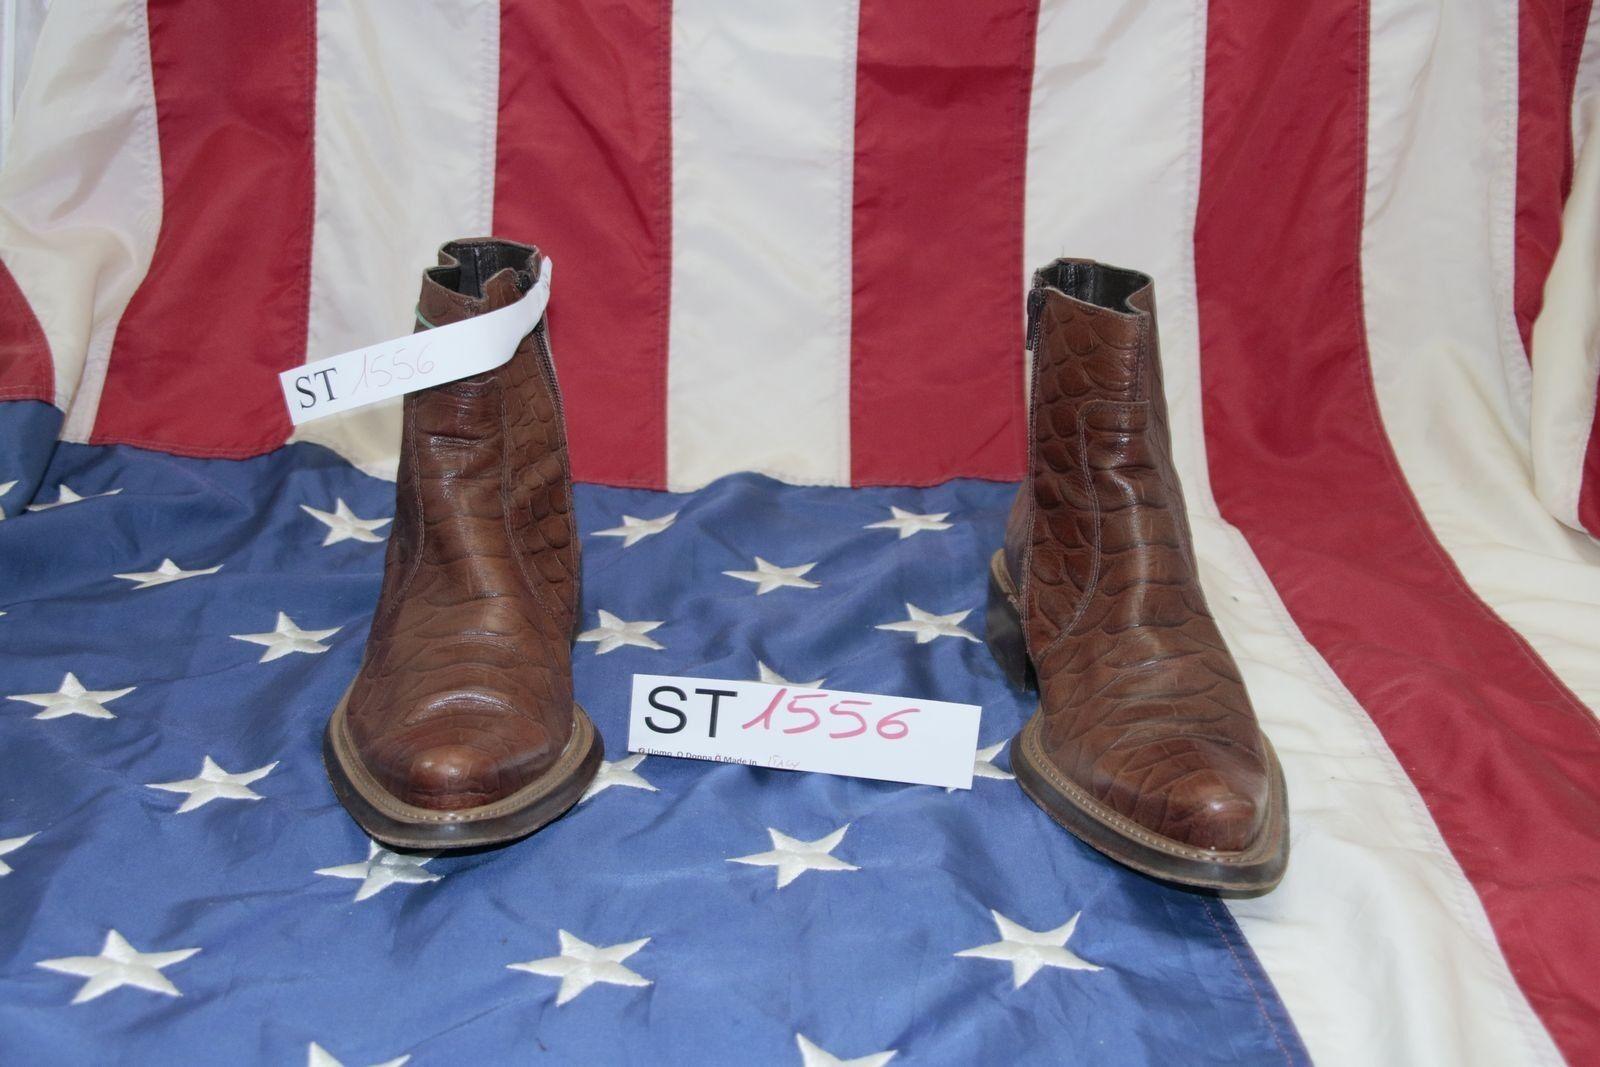 Stiefel Cowboy Contatto N.44Cod. ST1556Stivaletti Cowboy Stiefel Western Country bikers 5d074c